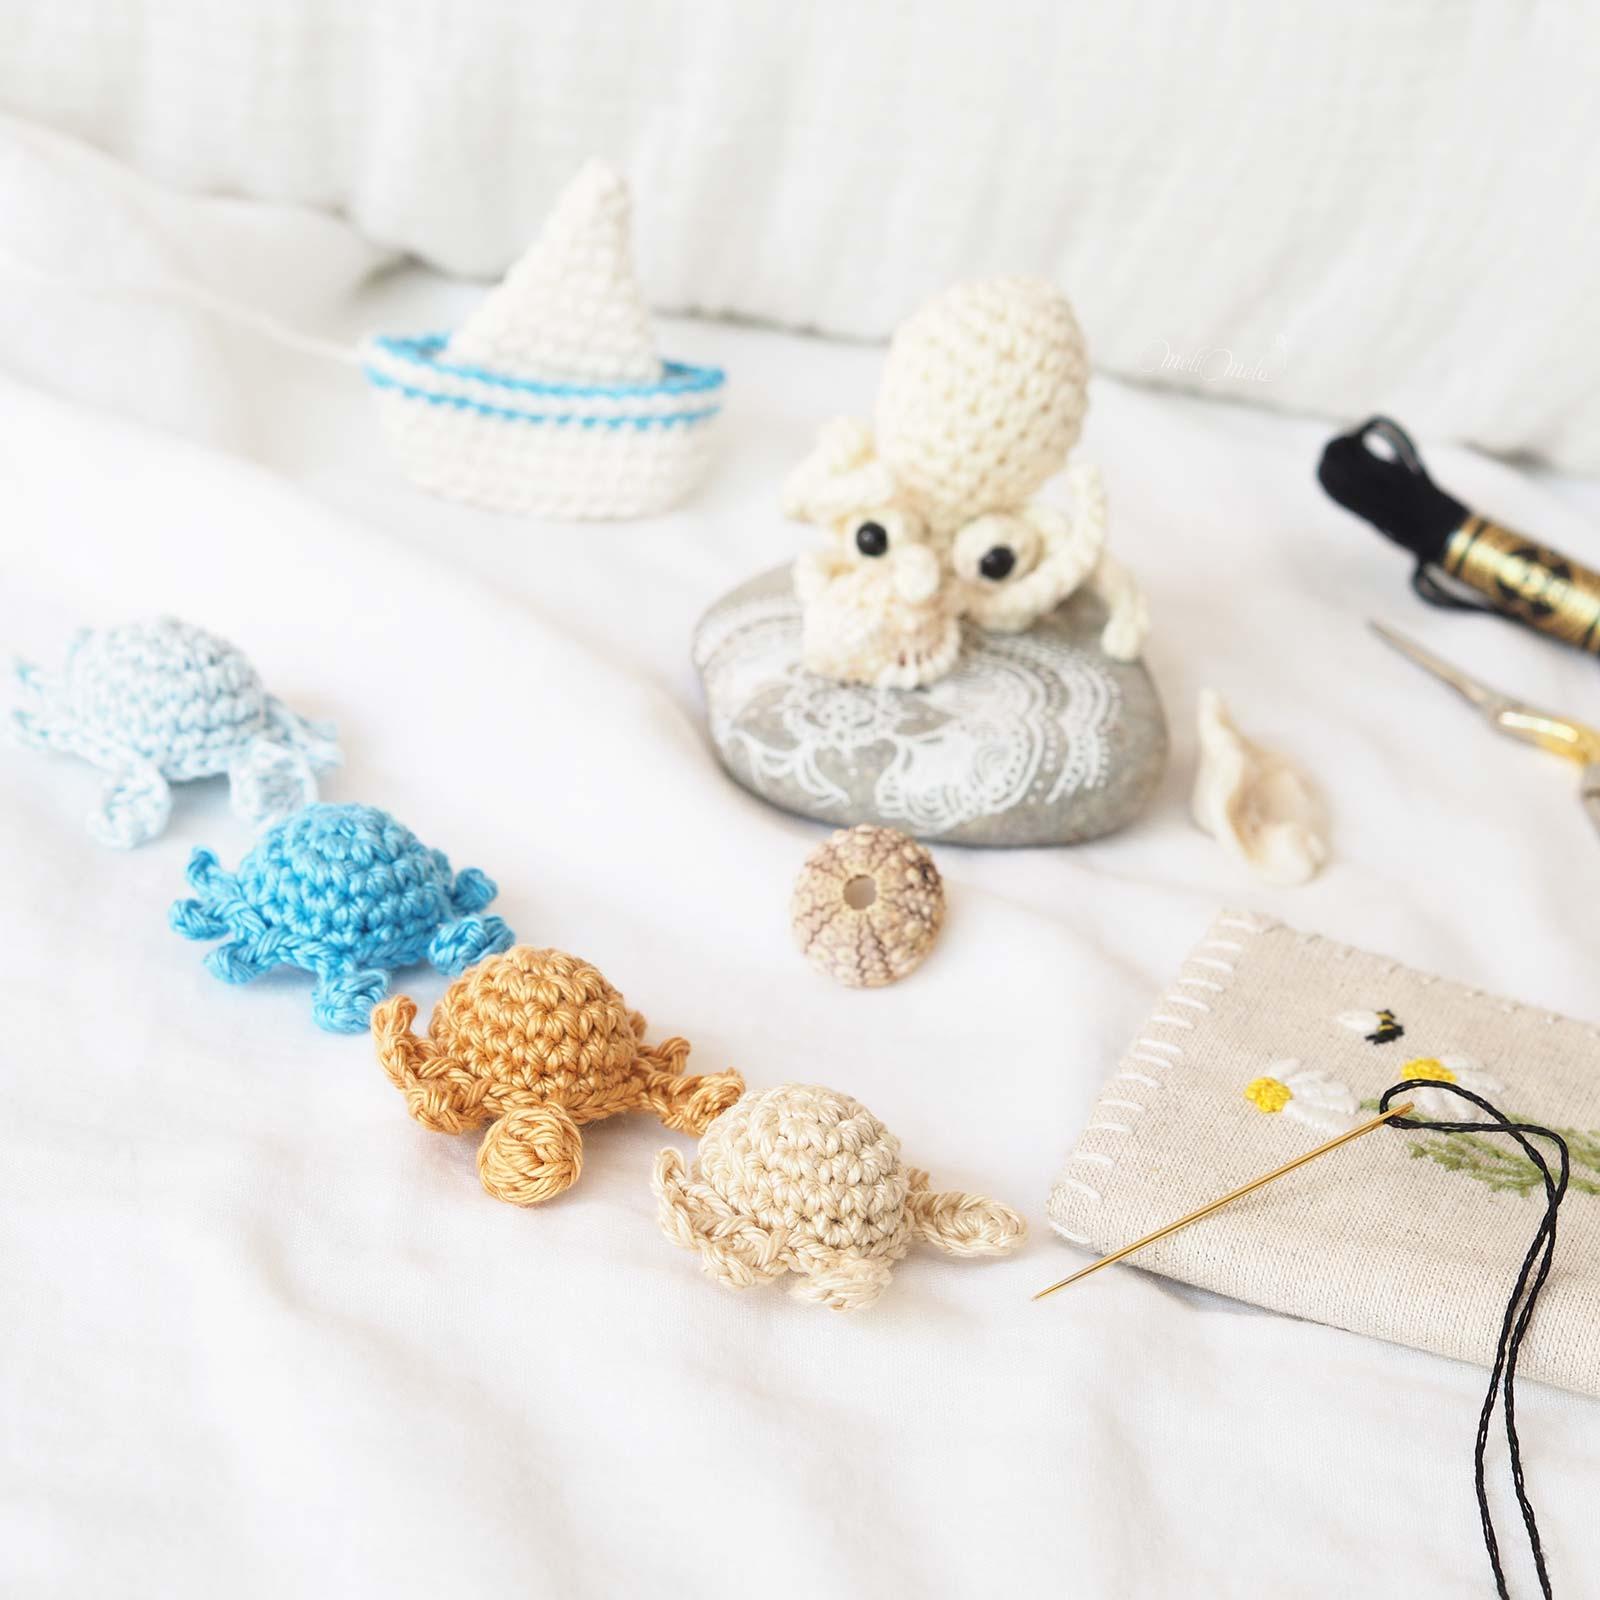 mini-poulpe-coquillage-crochet-encours-laboutiquedemelimelo